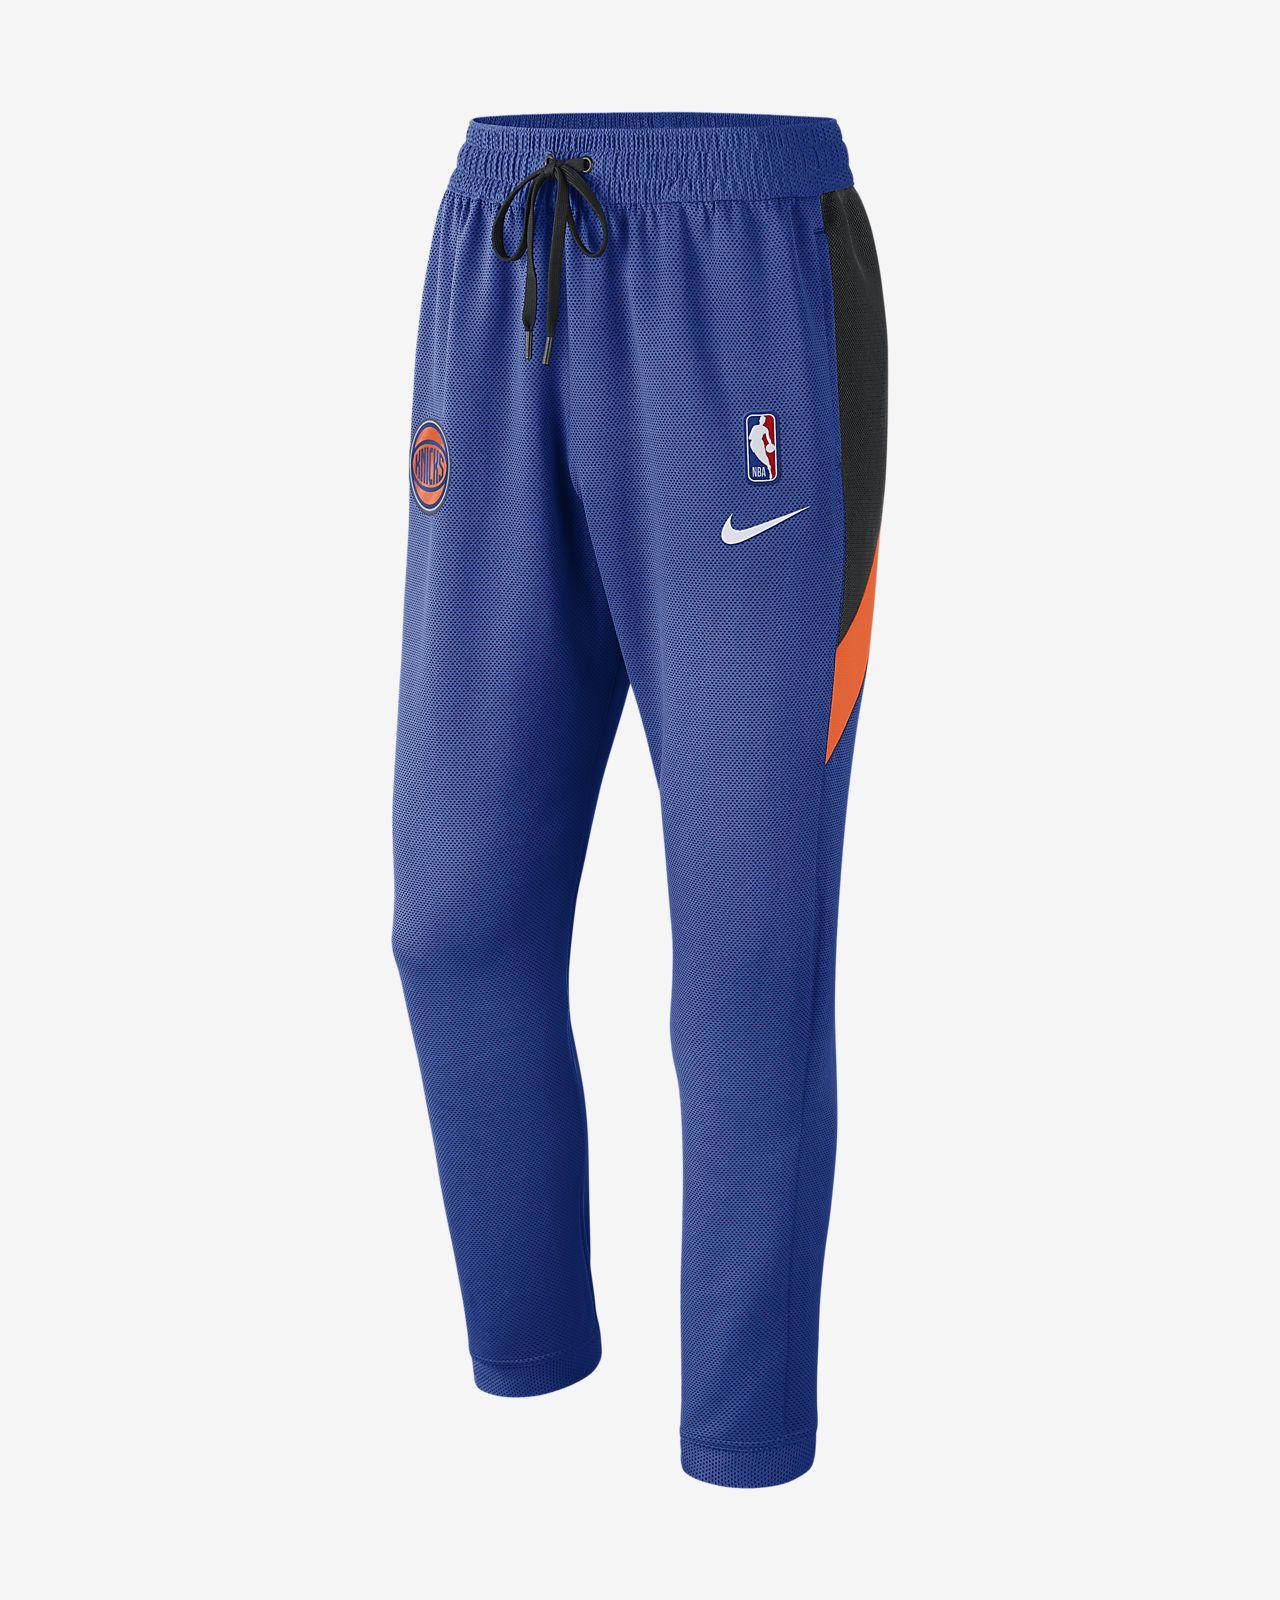 New York Knicks Nike Therma Flex Showtime Men's NBA Trousers